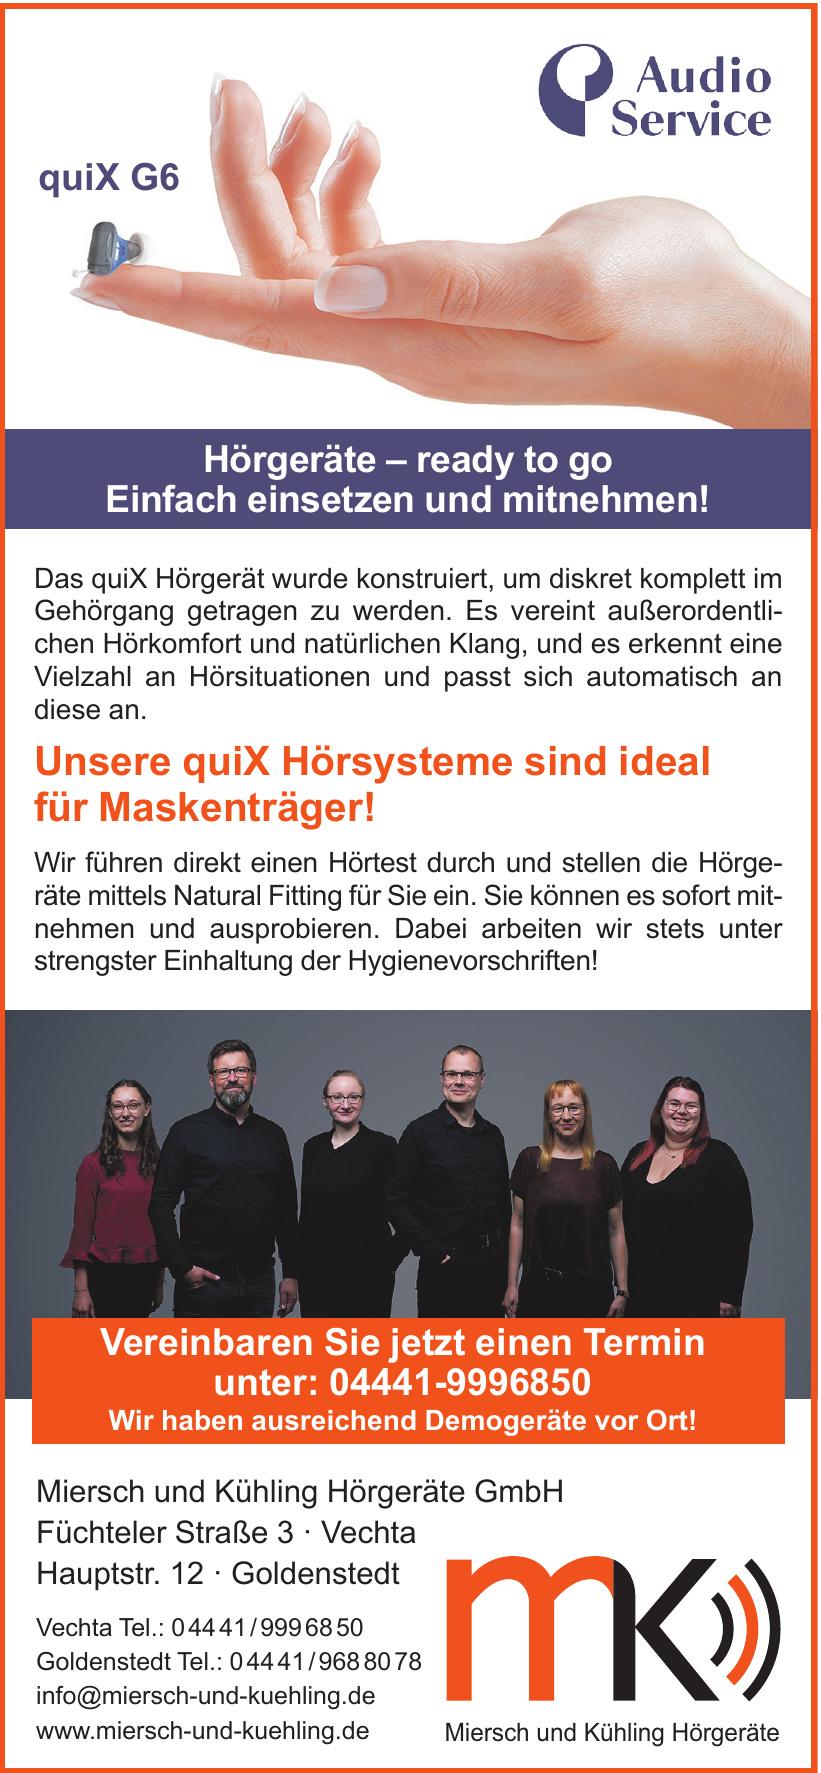 Miersch und Kühling Hörgeräte GmbH